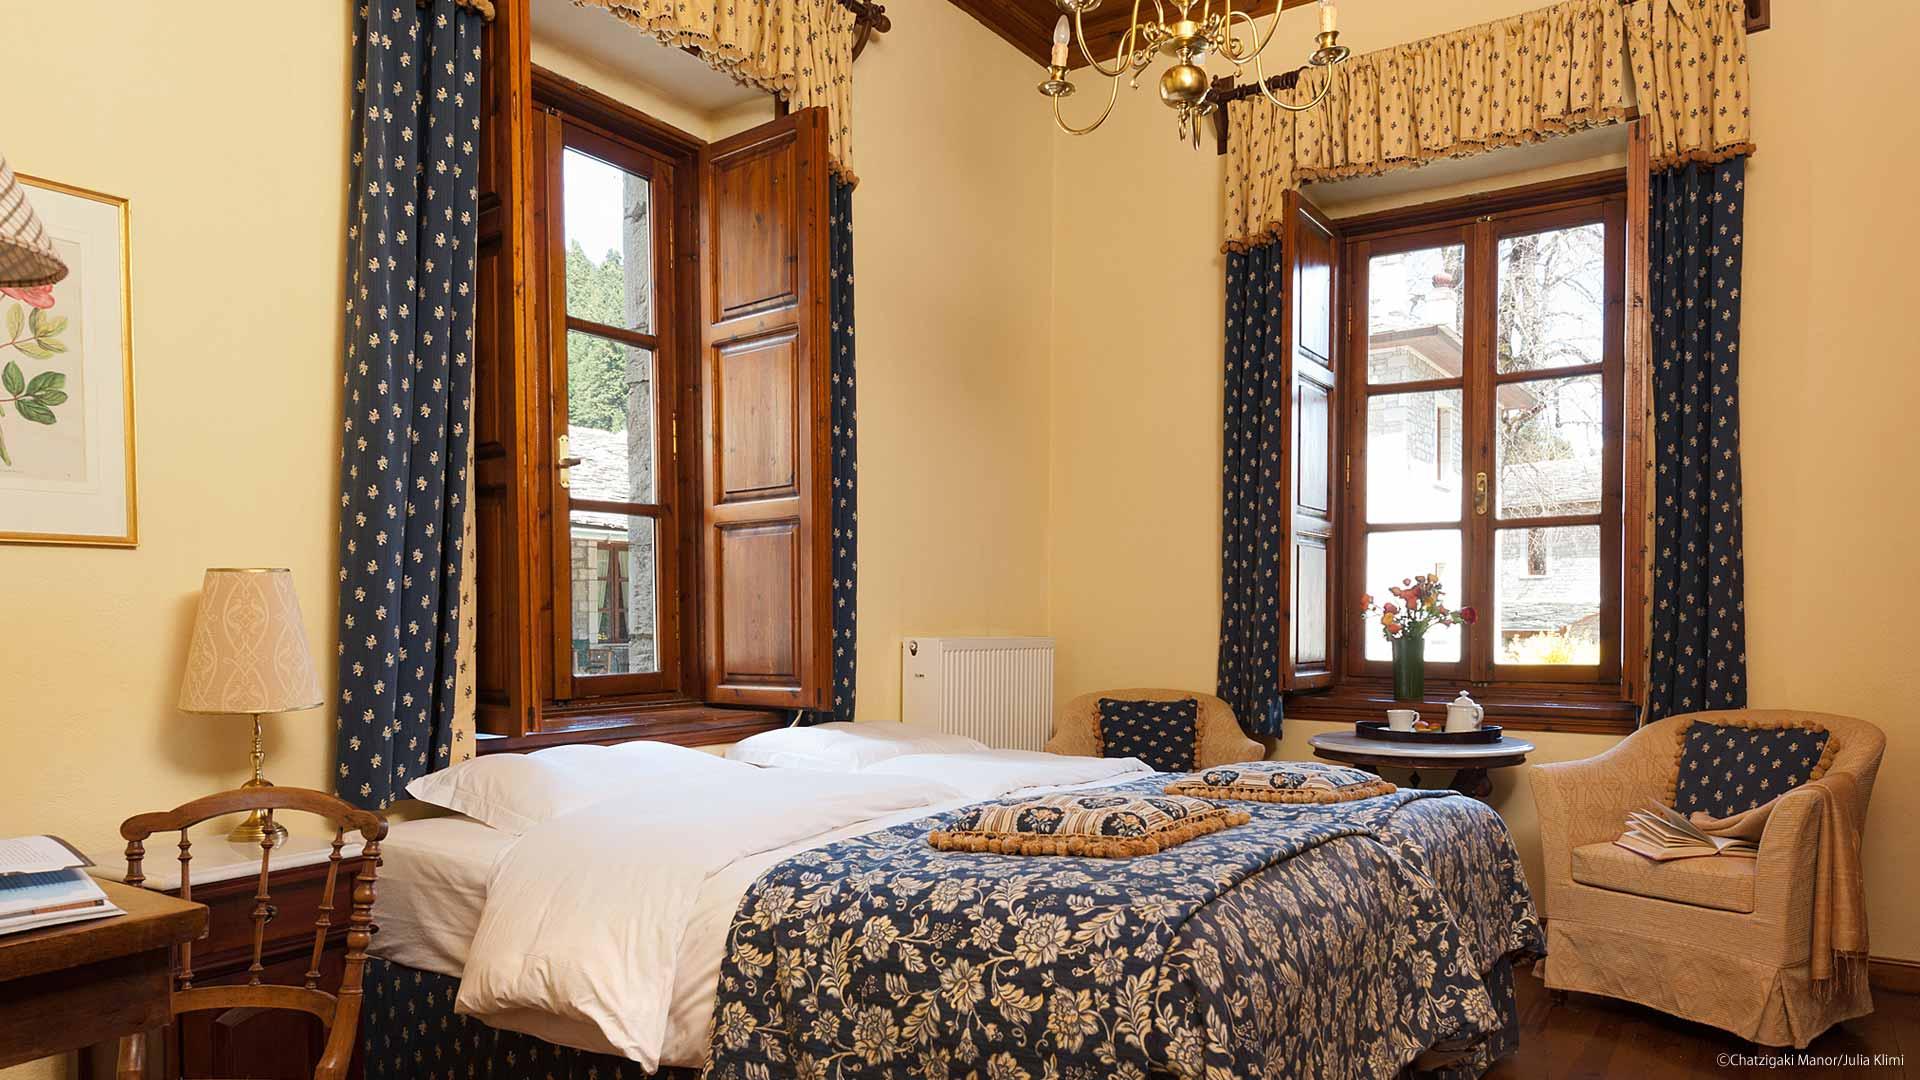 Classic δωμάτια - Αρχοντικό Χατζηγάκη